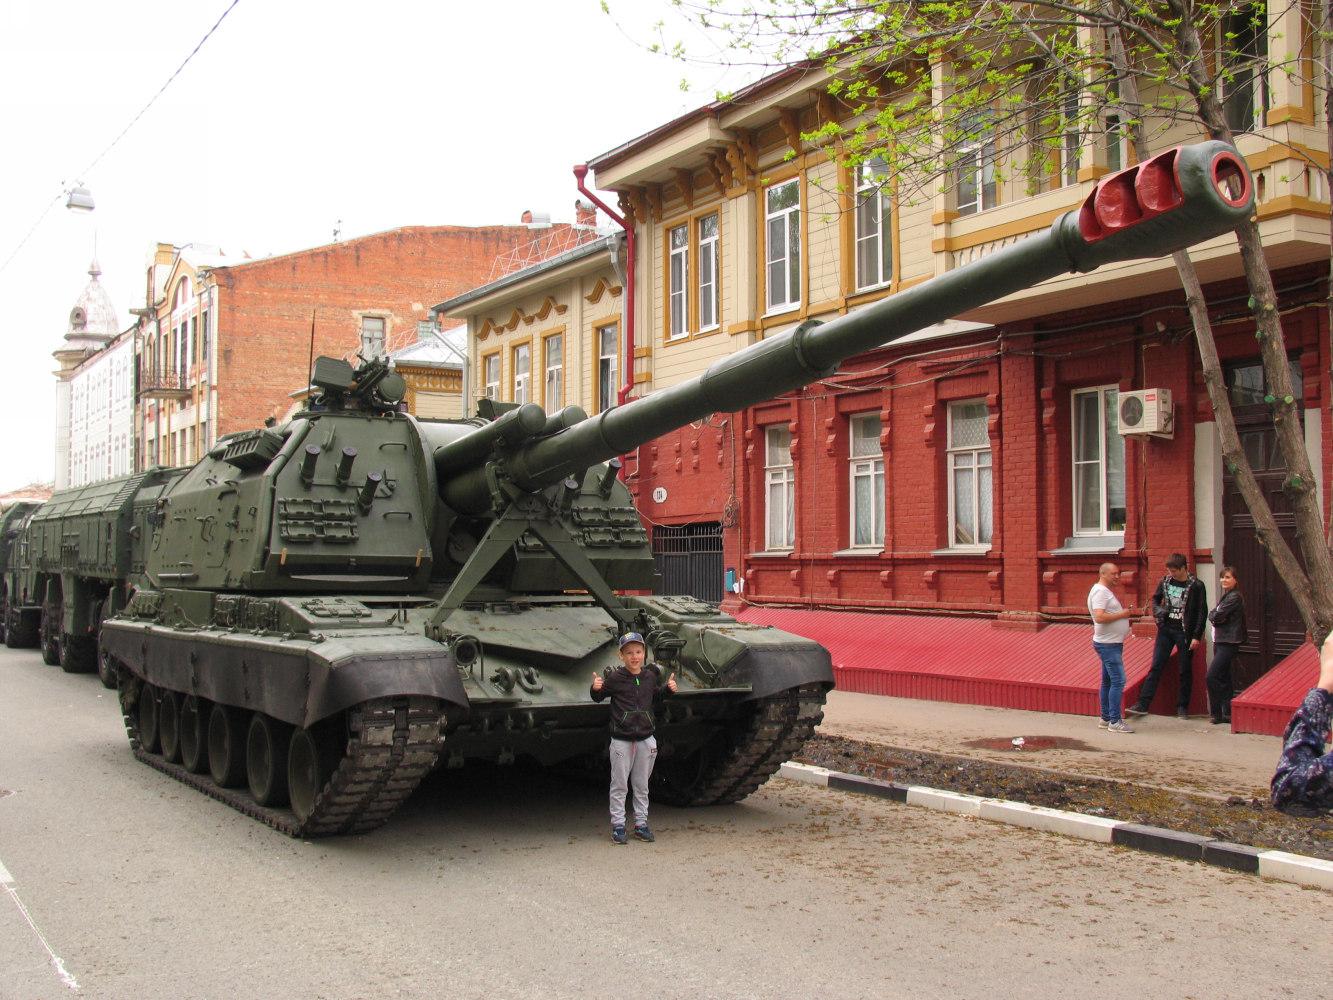 самоходное артиллерийское орудие 2С19 Мста. г. Самара, ул Молодогвардейцская